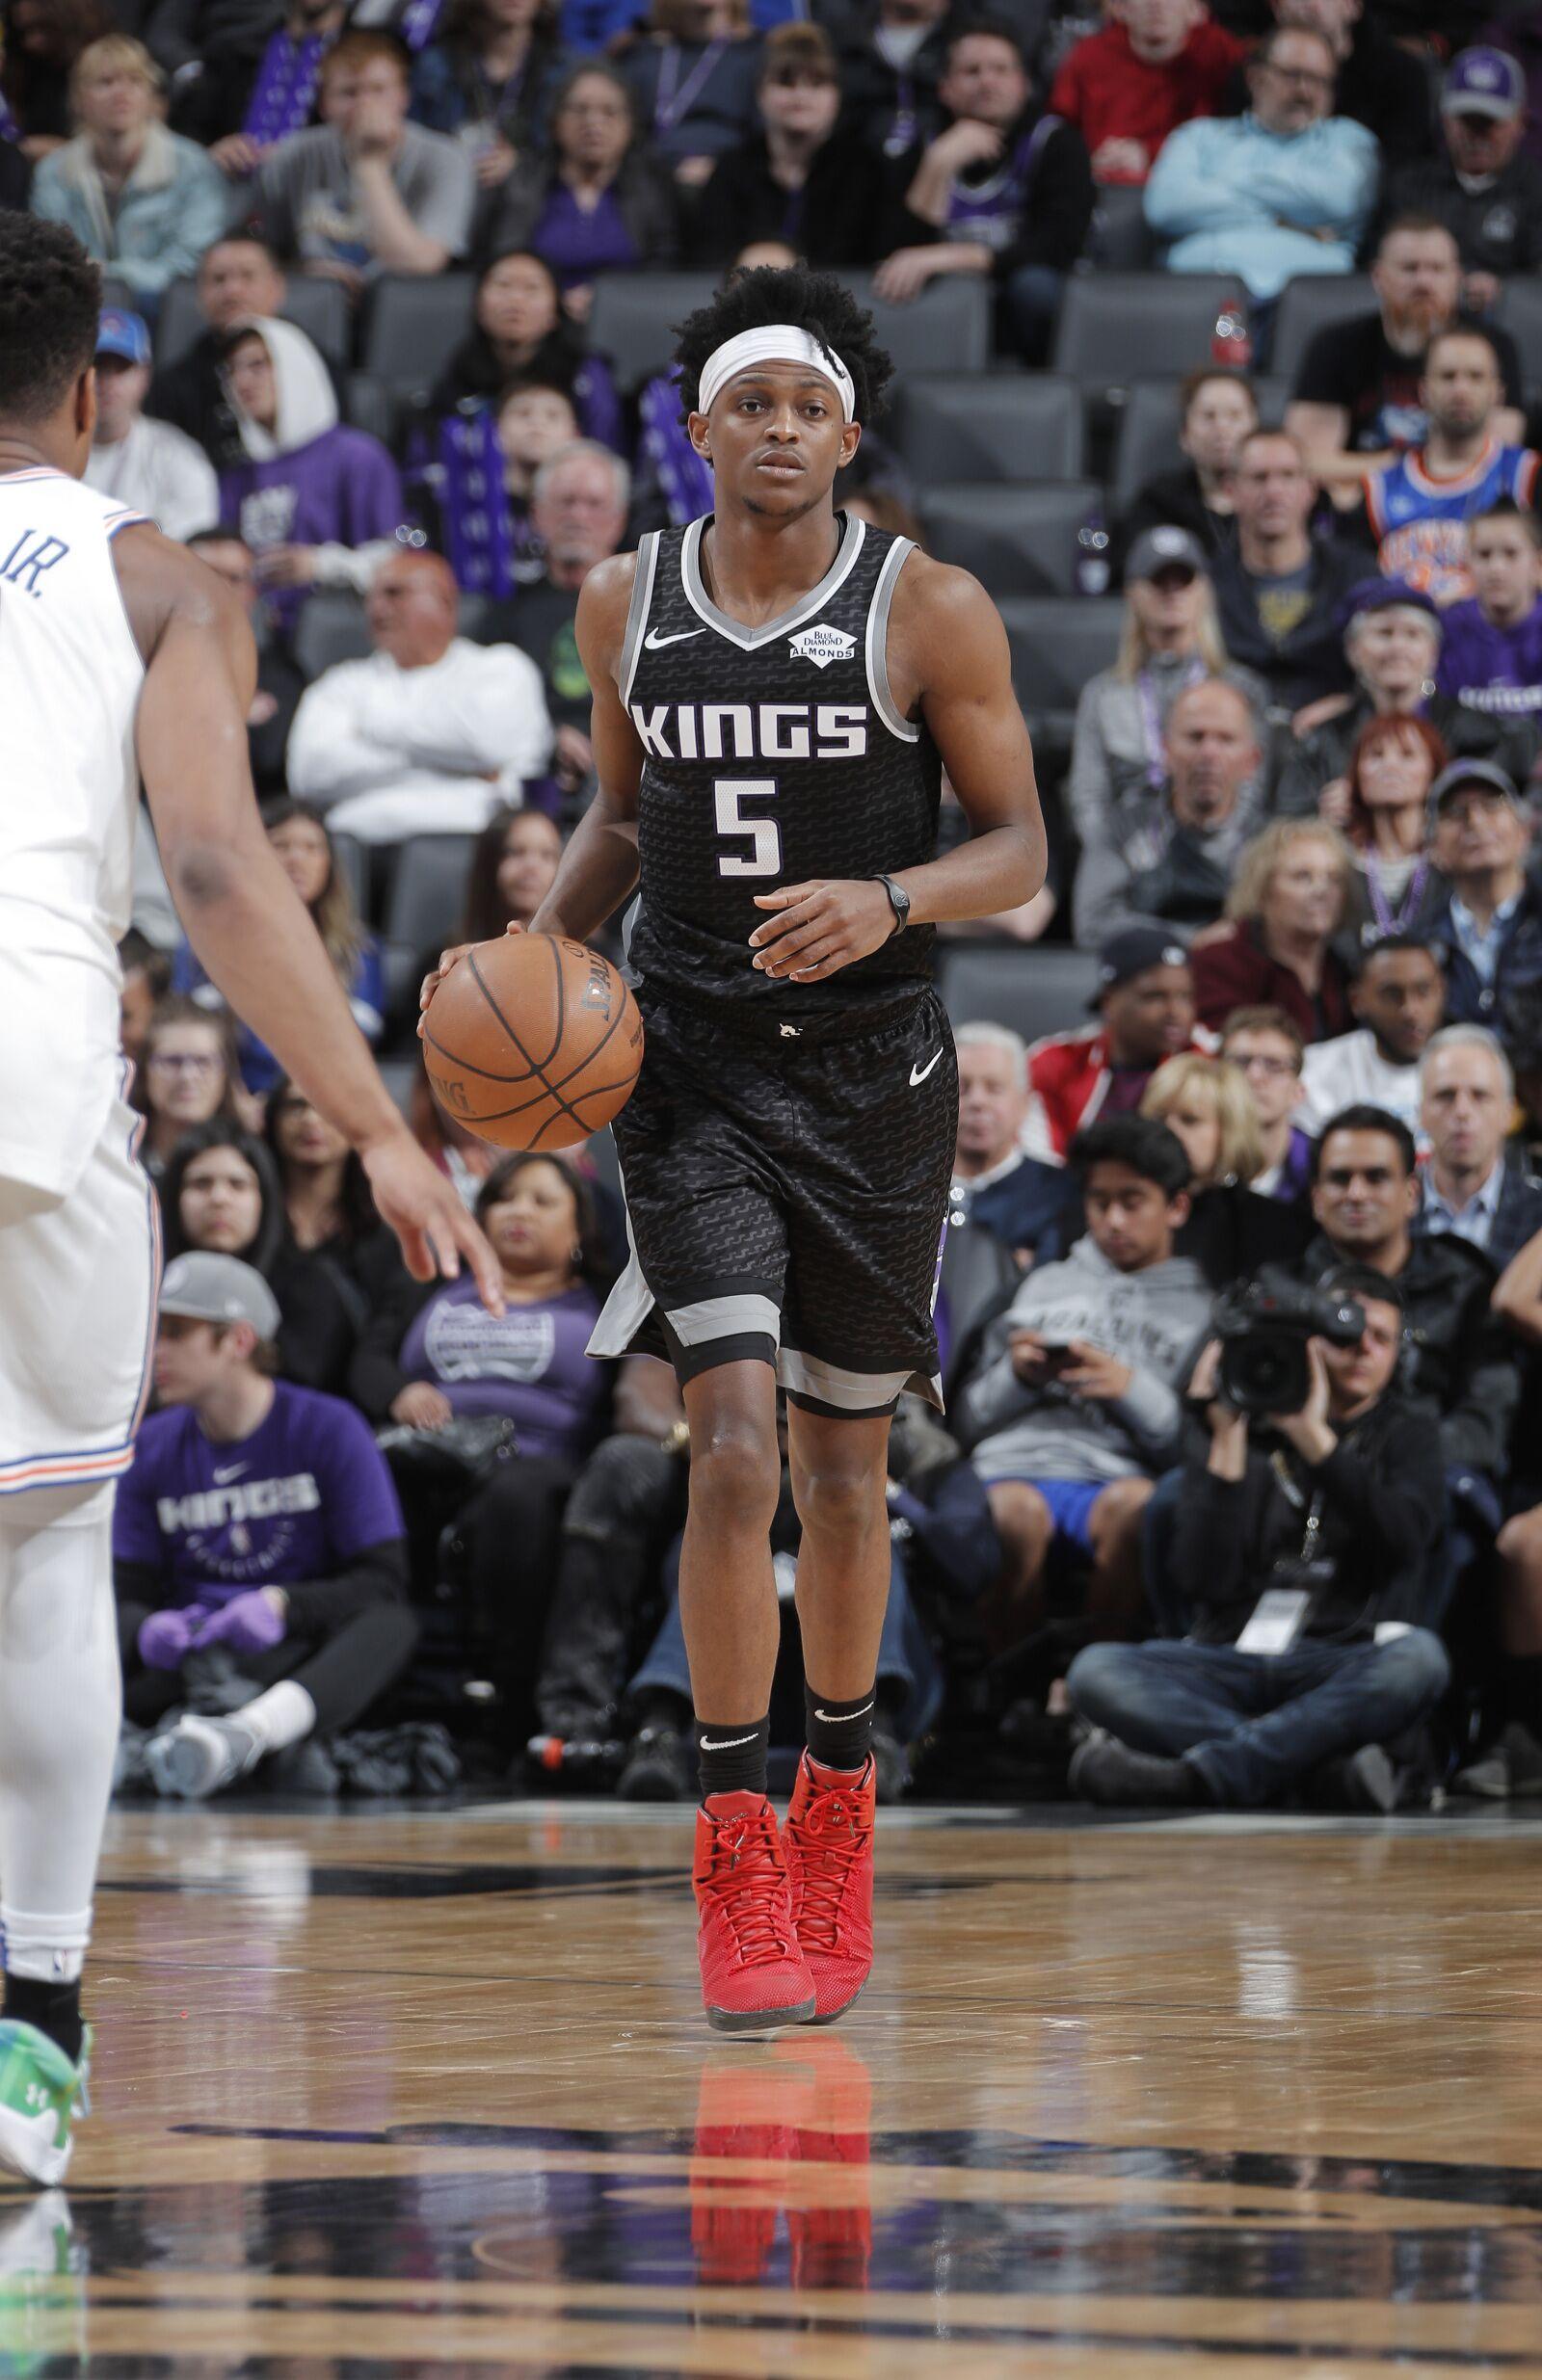 Kings vs. Knicks Preview: Odds, Injuries, & Predictions